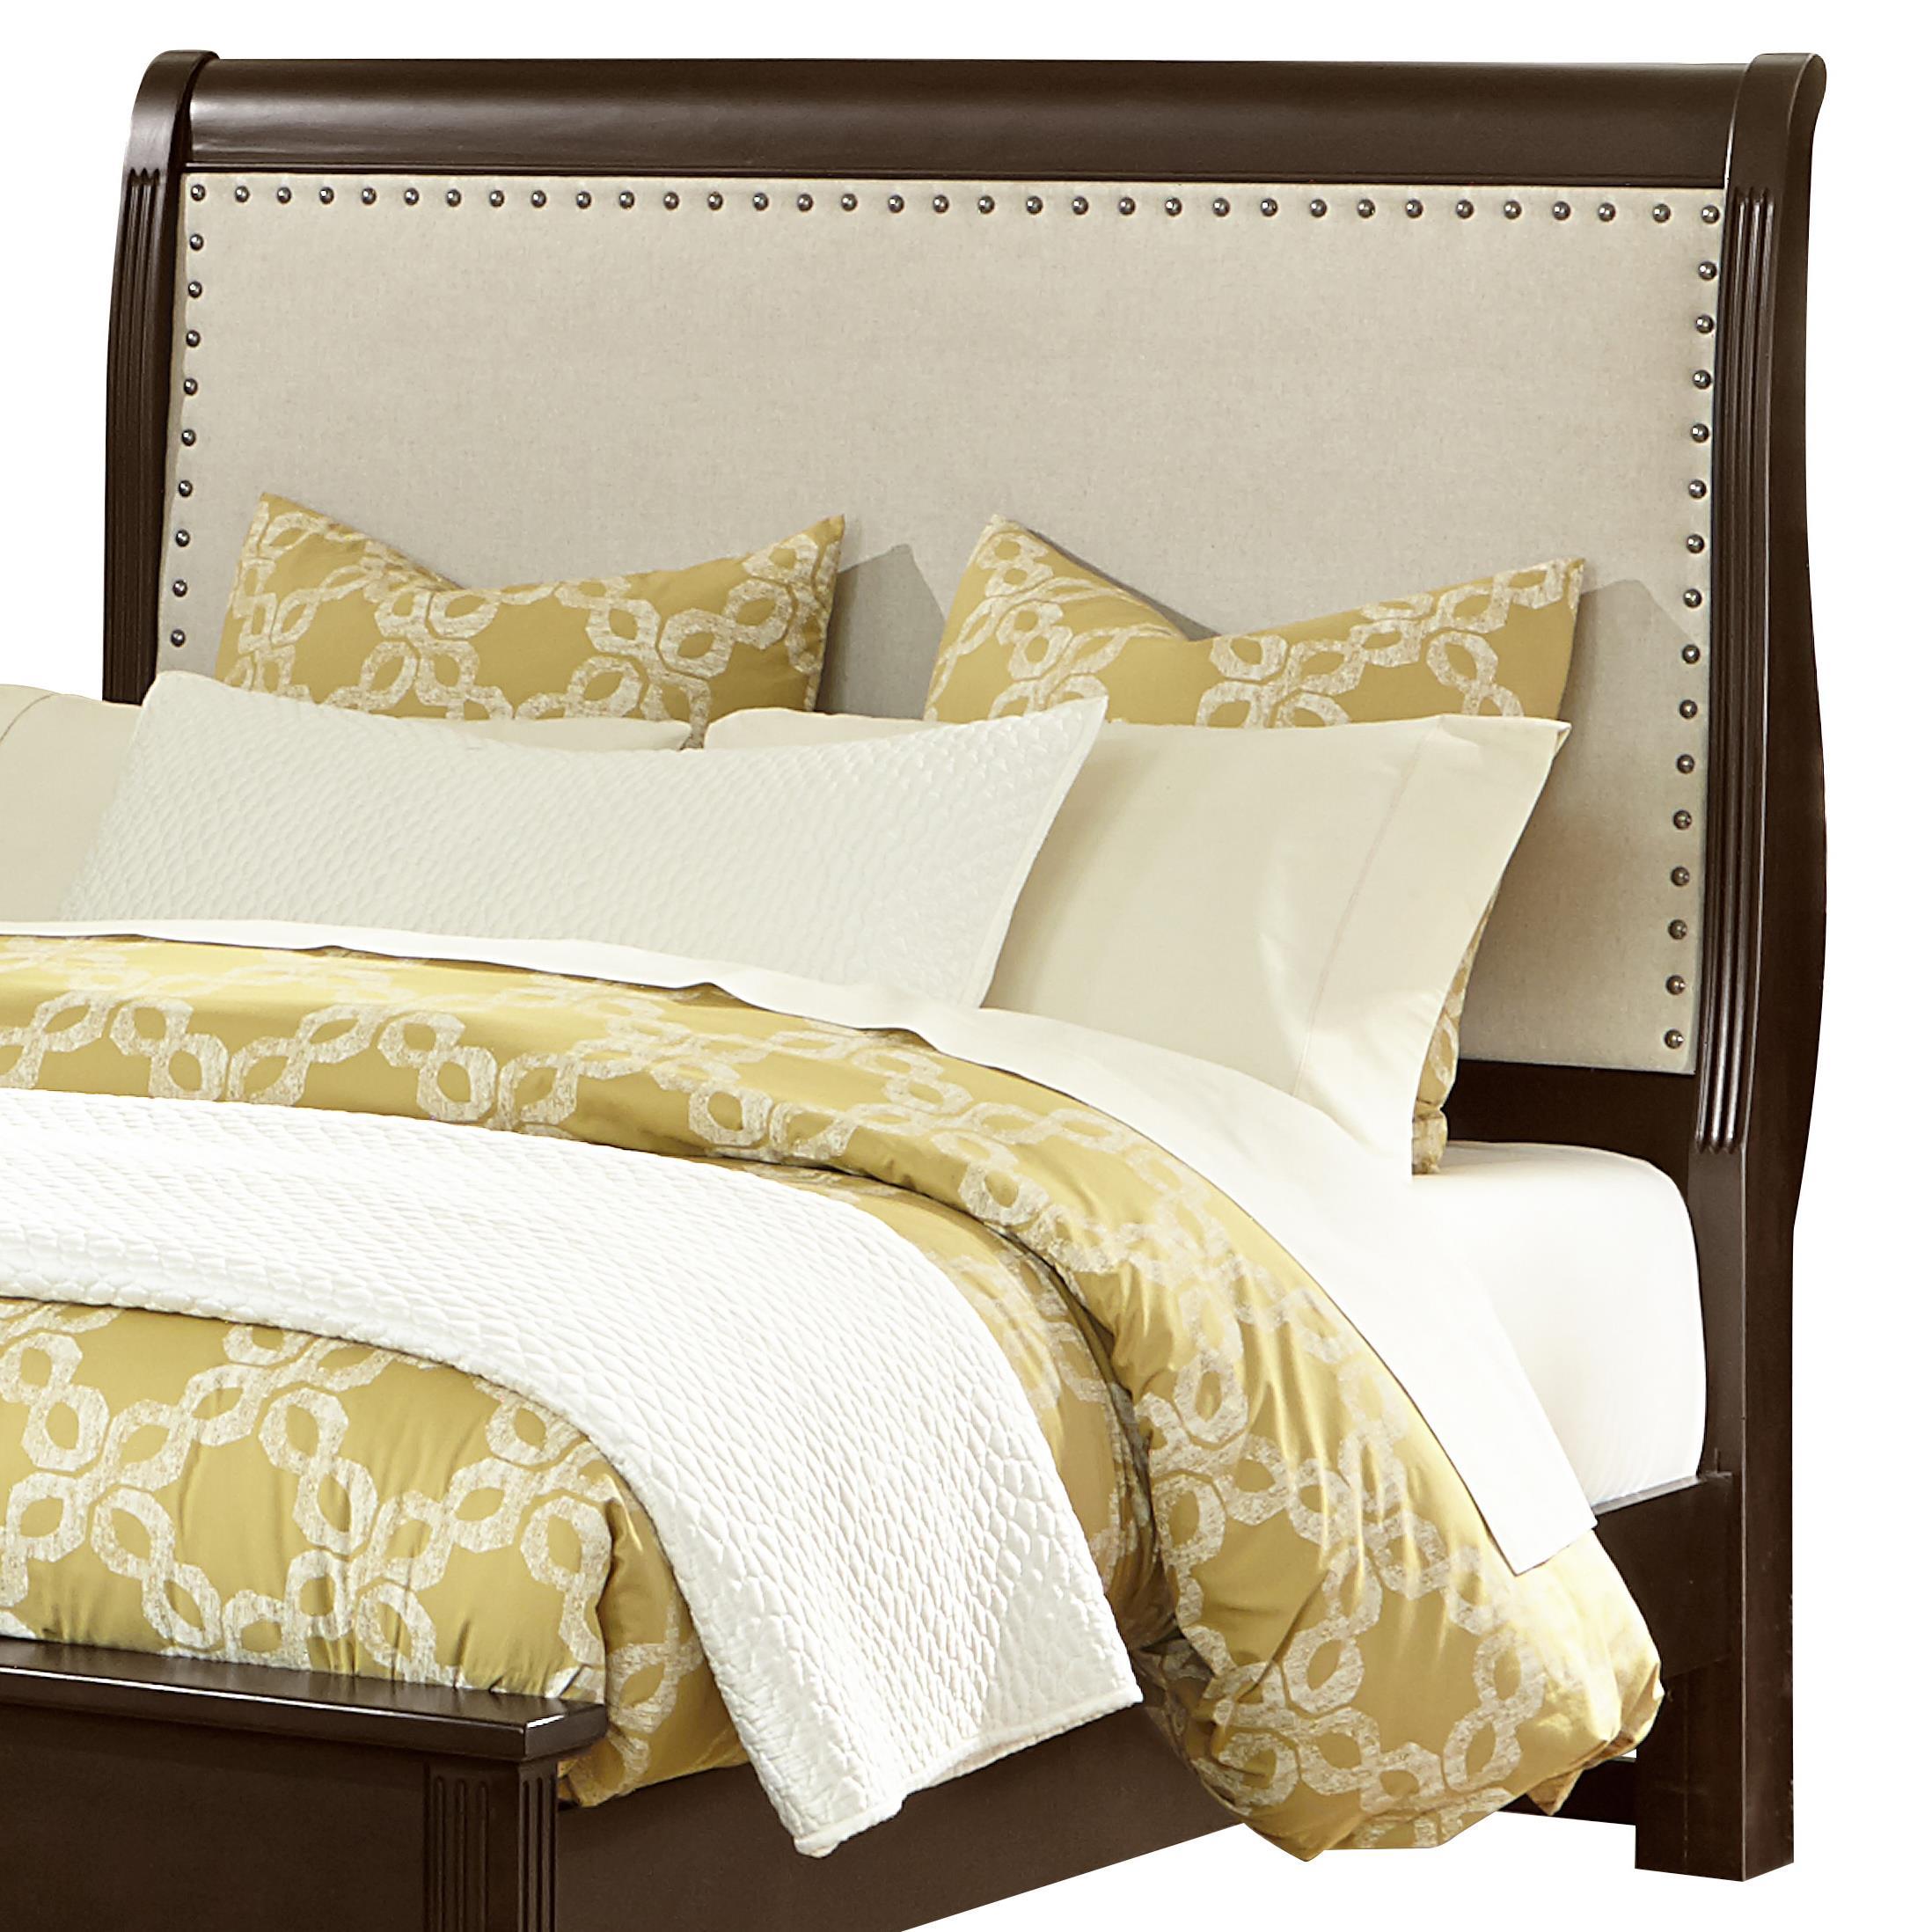 Vaughan Bassett French Market Twin Upholstered Headboard (Linen) - Item Number: 380-222